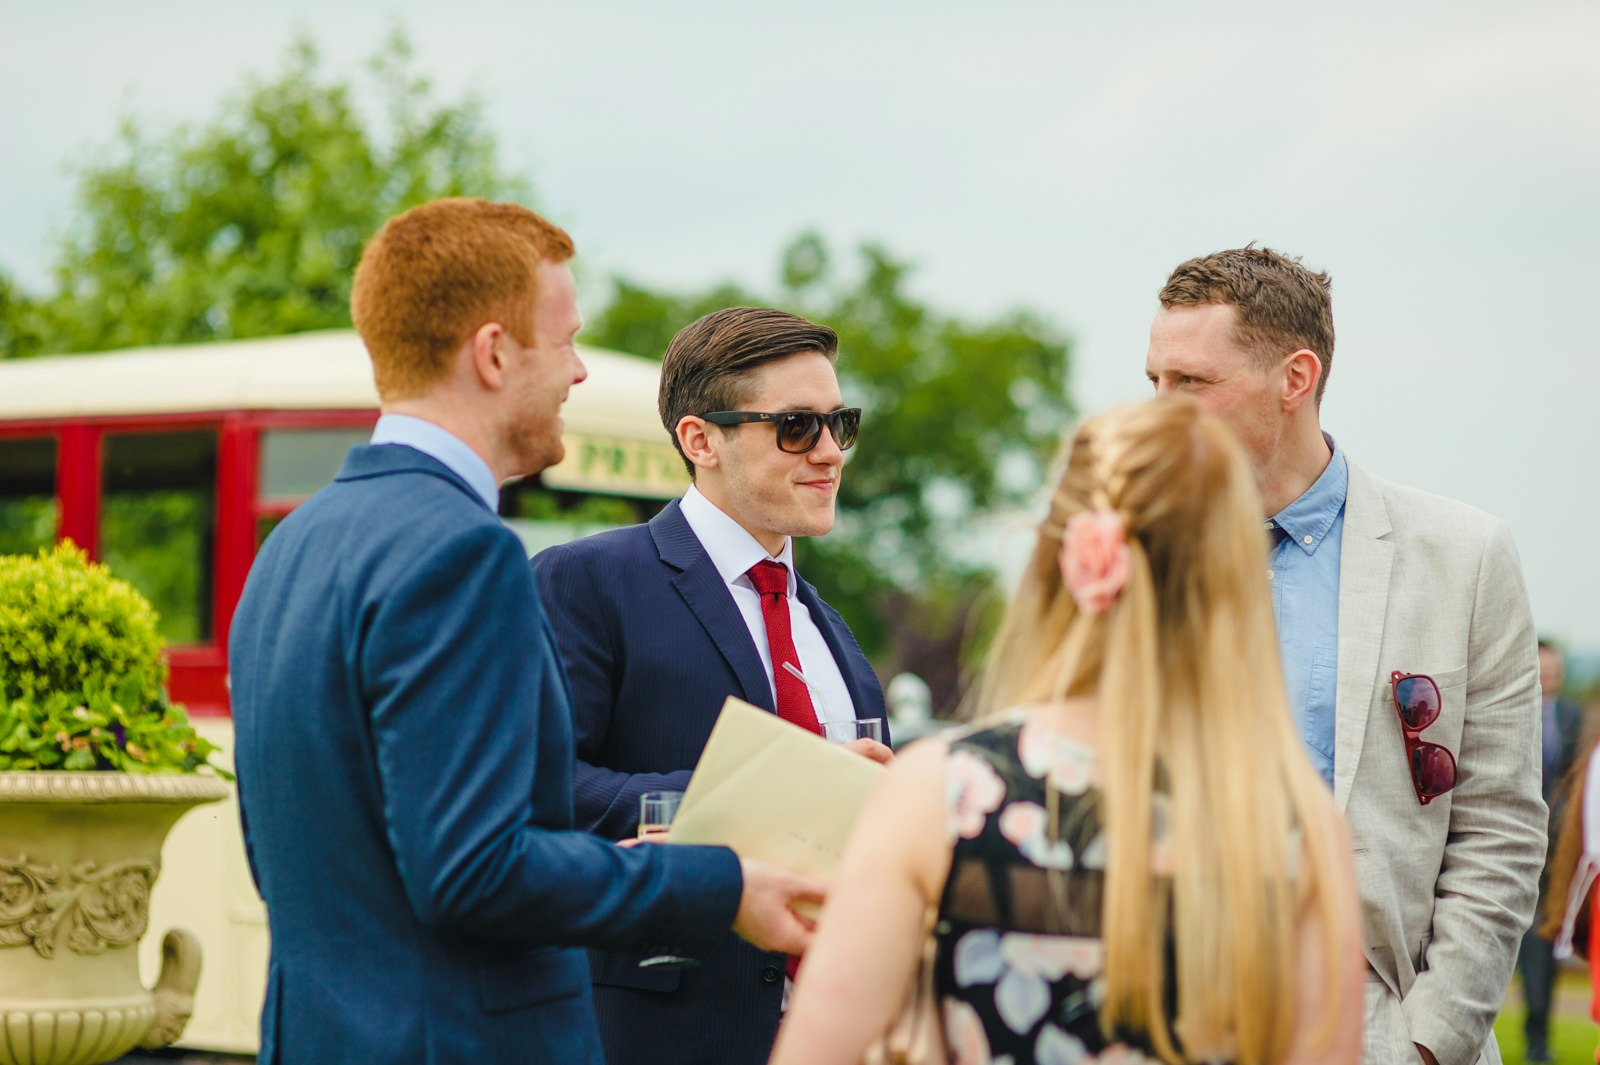 Millers Of Netley wedding, Dorrington, Shrewsbury | Emma + Ben 53